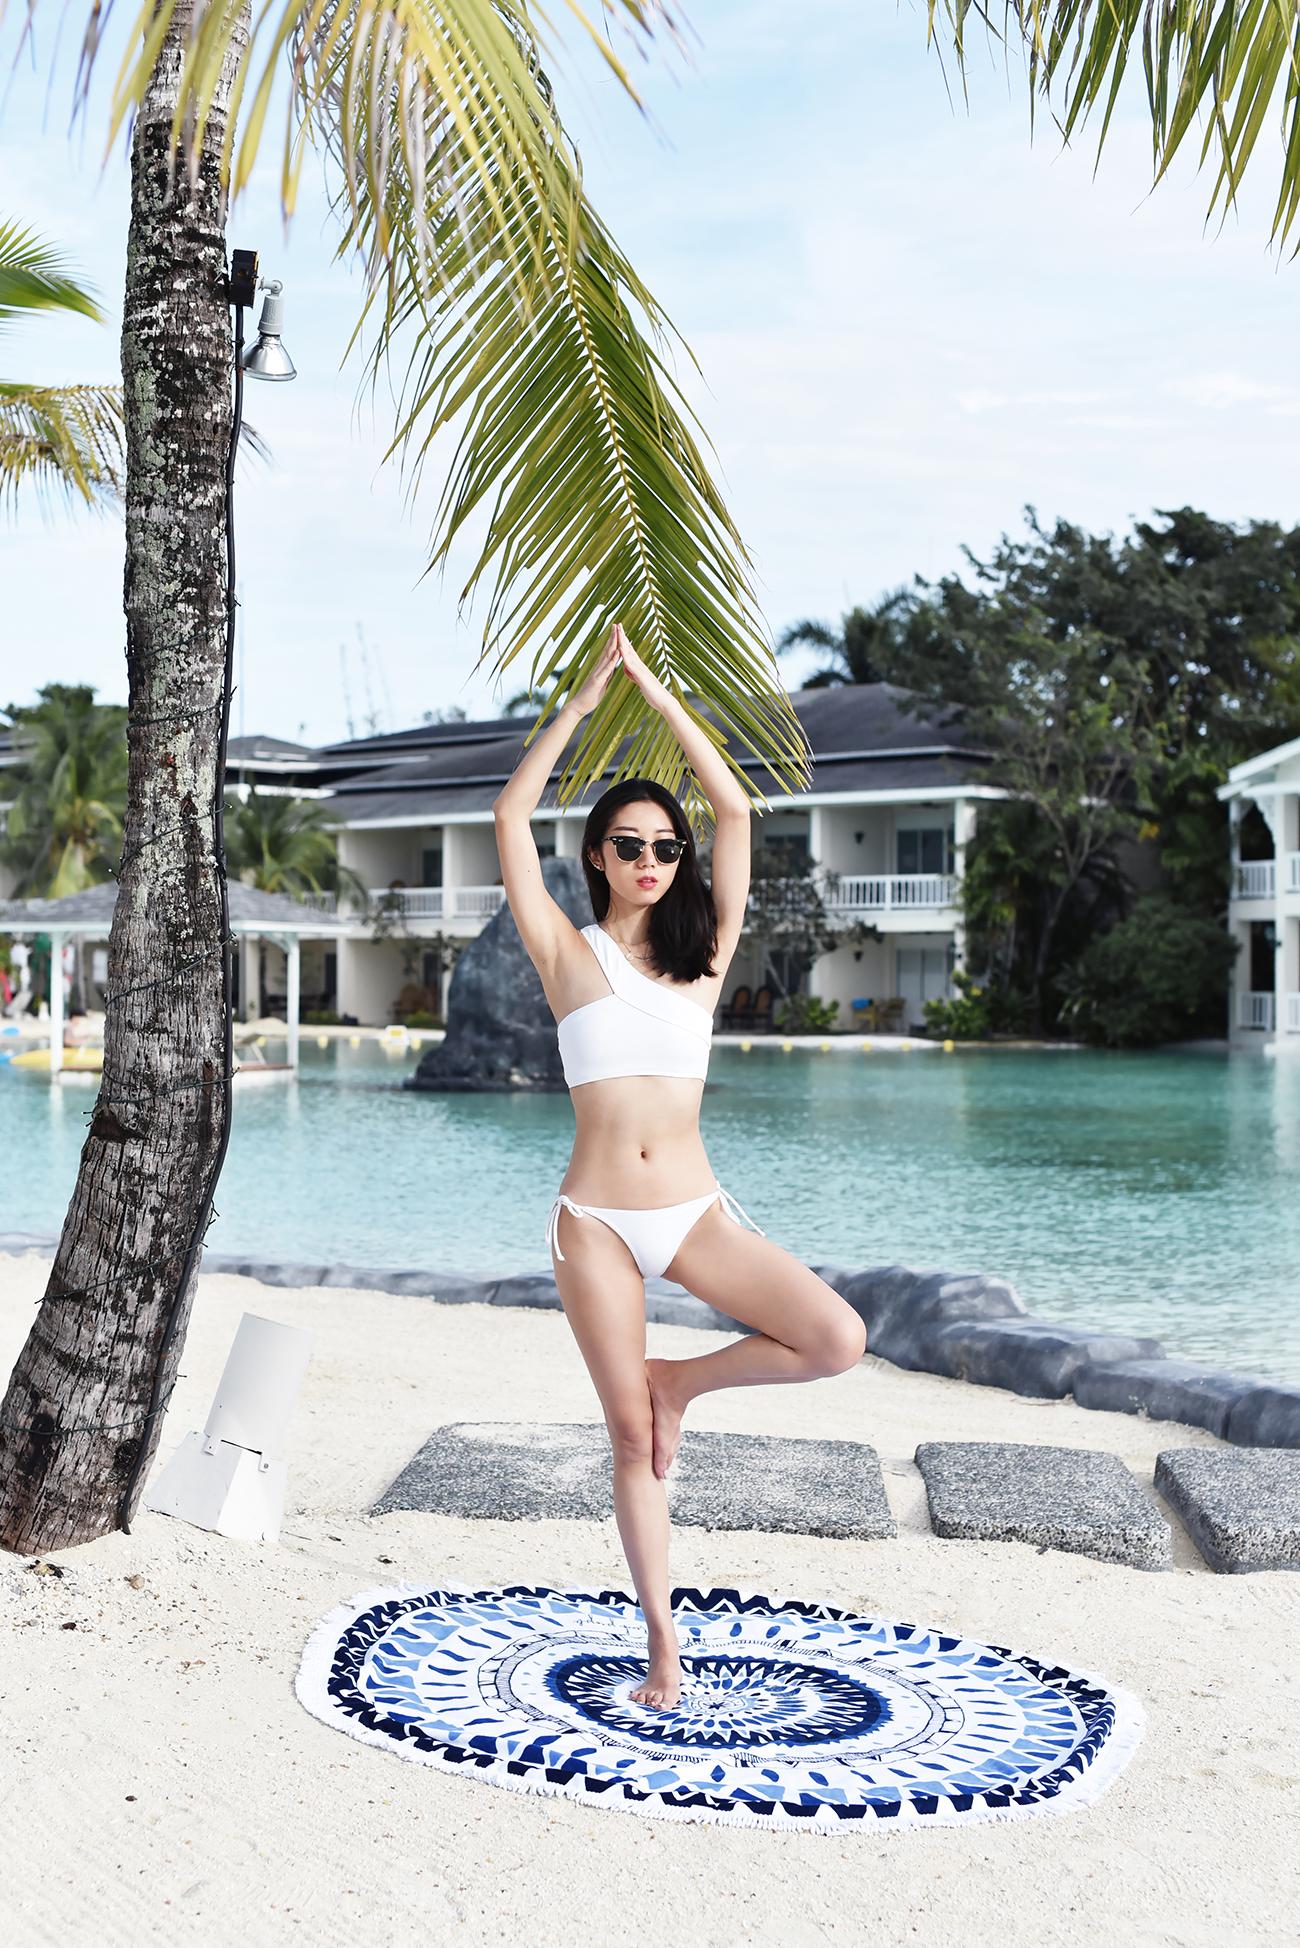 PlantationBay-Cebu-TheBeachPeople-Bikini-5